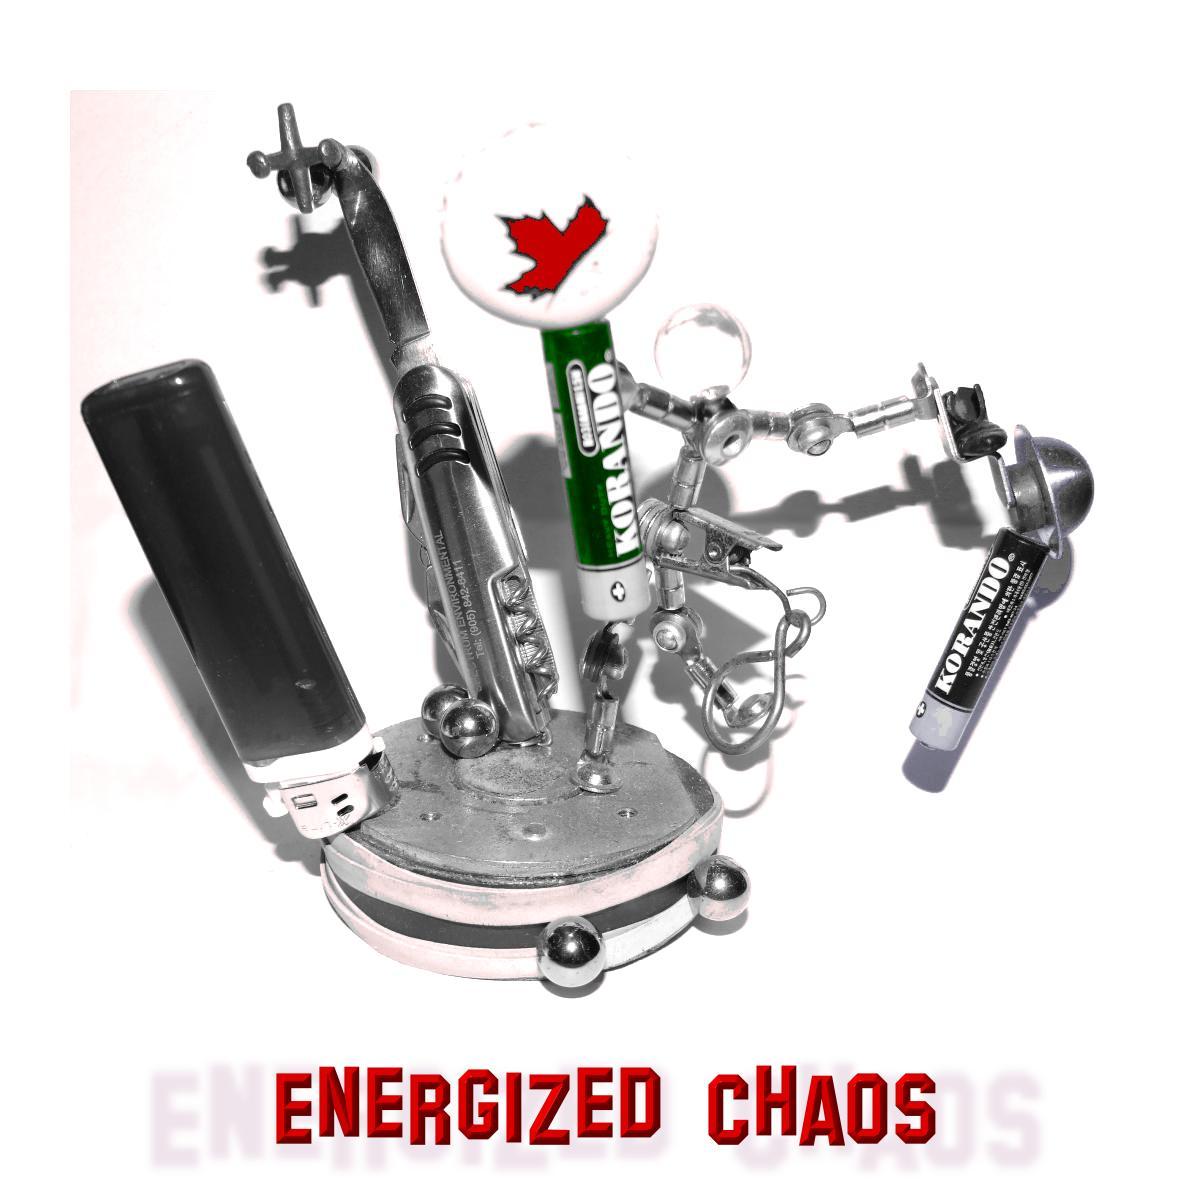 ENERGIZED CHAOS